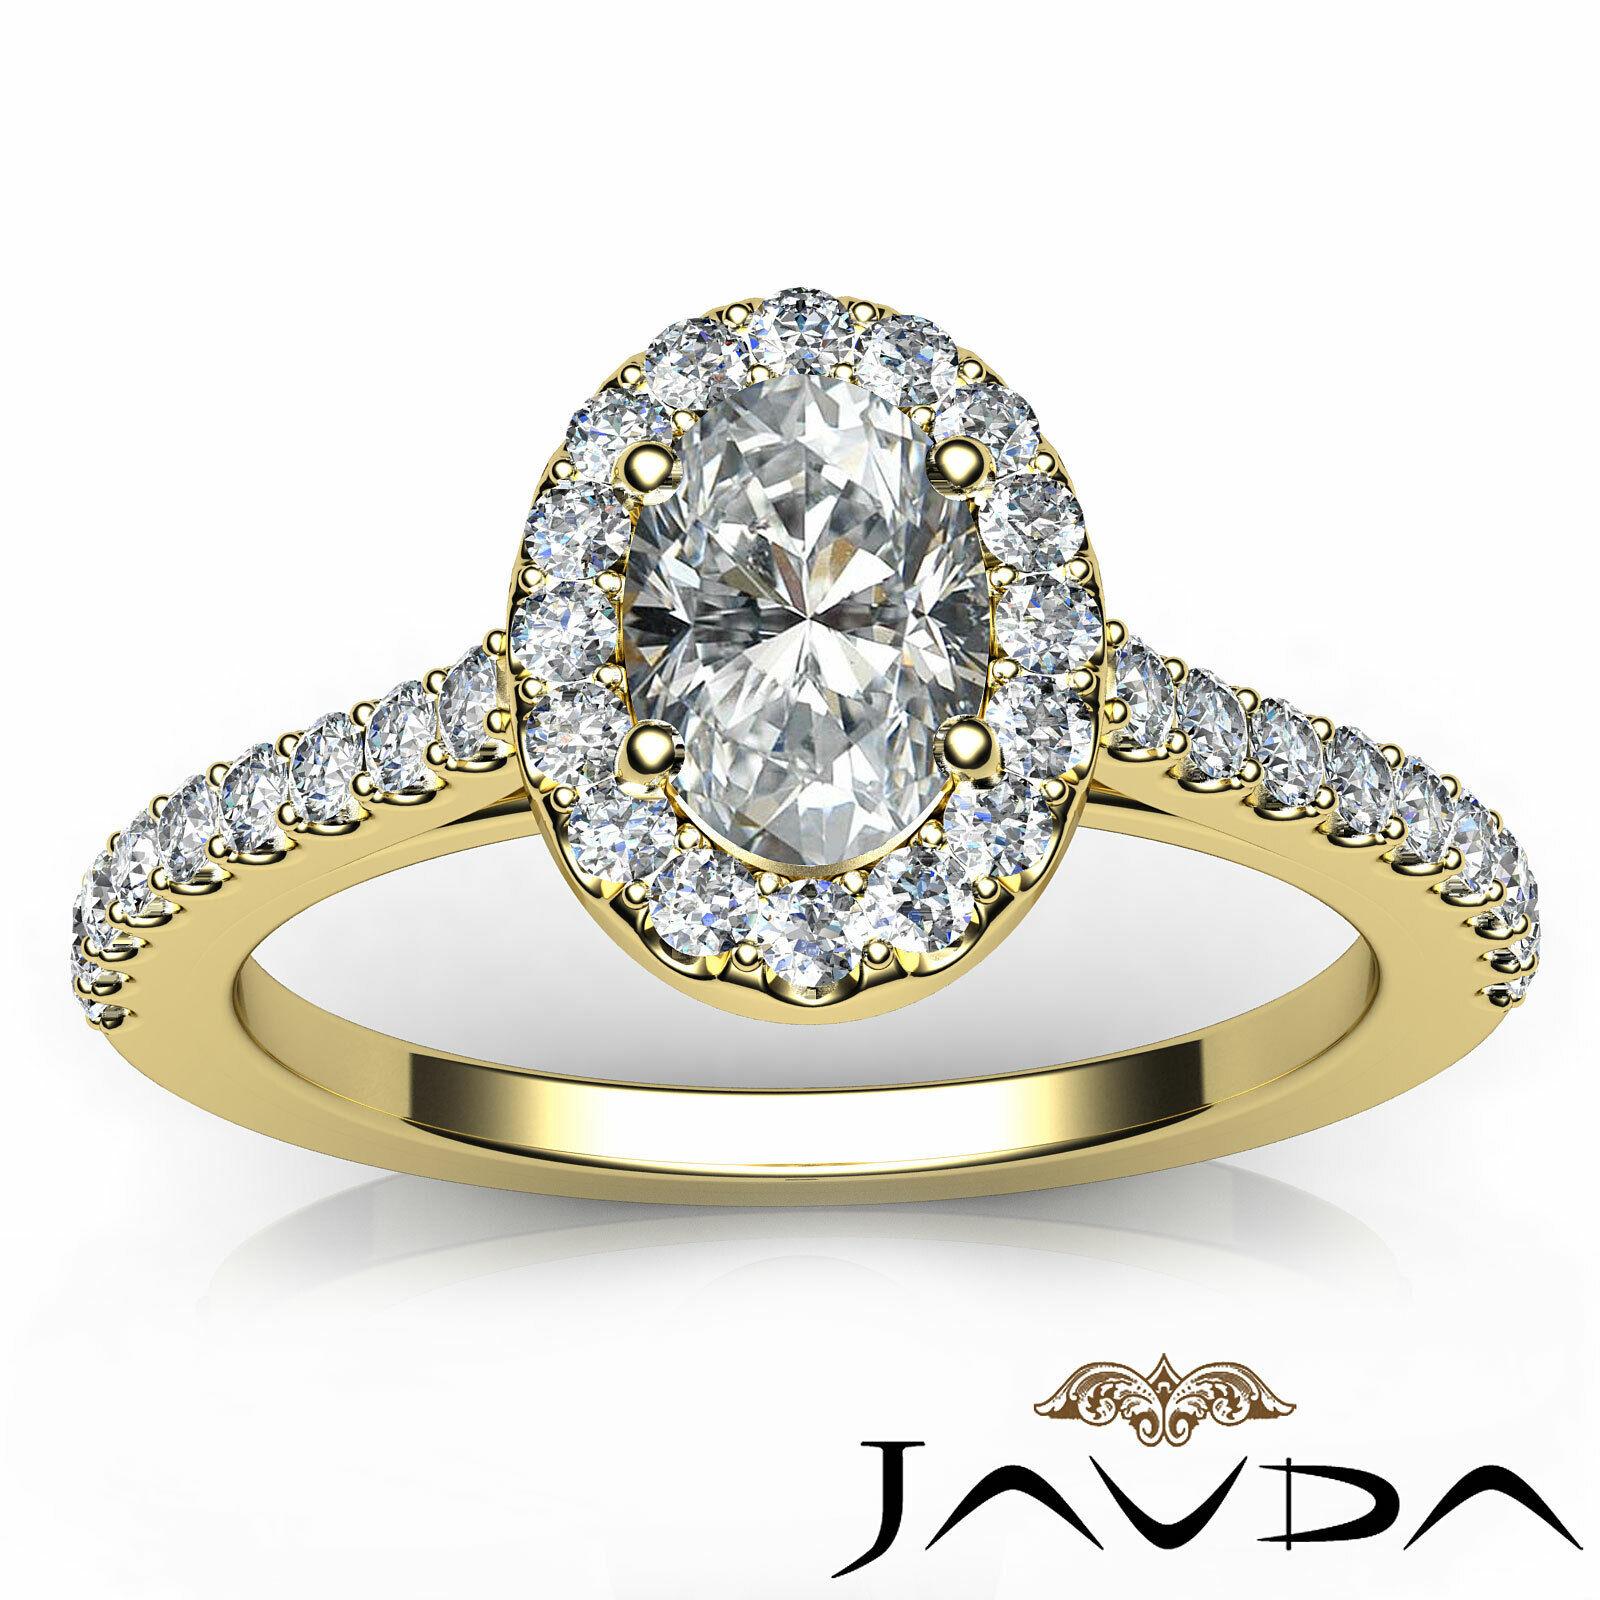 1.6ctw Prong Setting Oval Diamond Engagement Ring GIA H-VS1 White Gold Women New 10